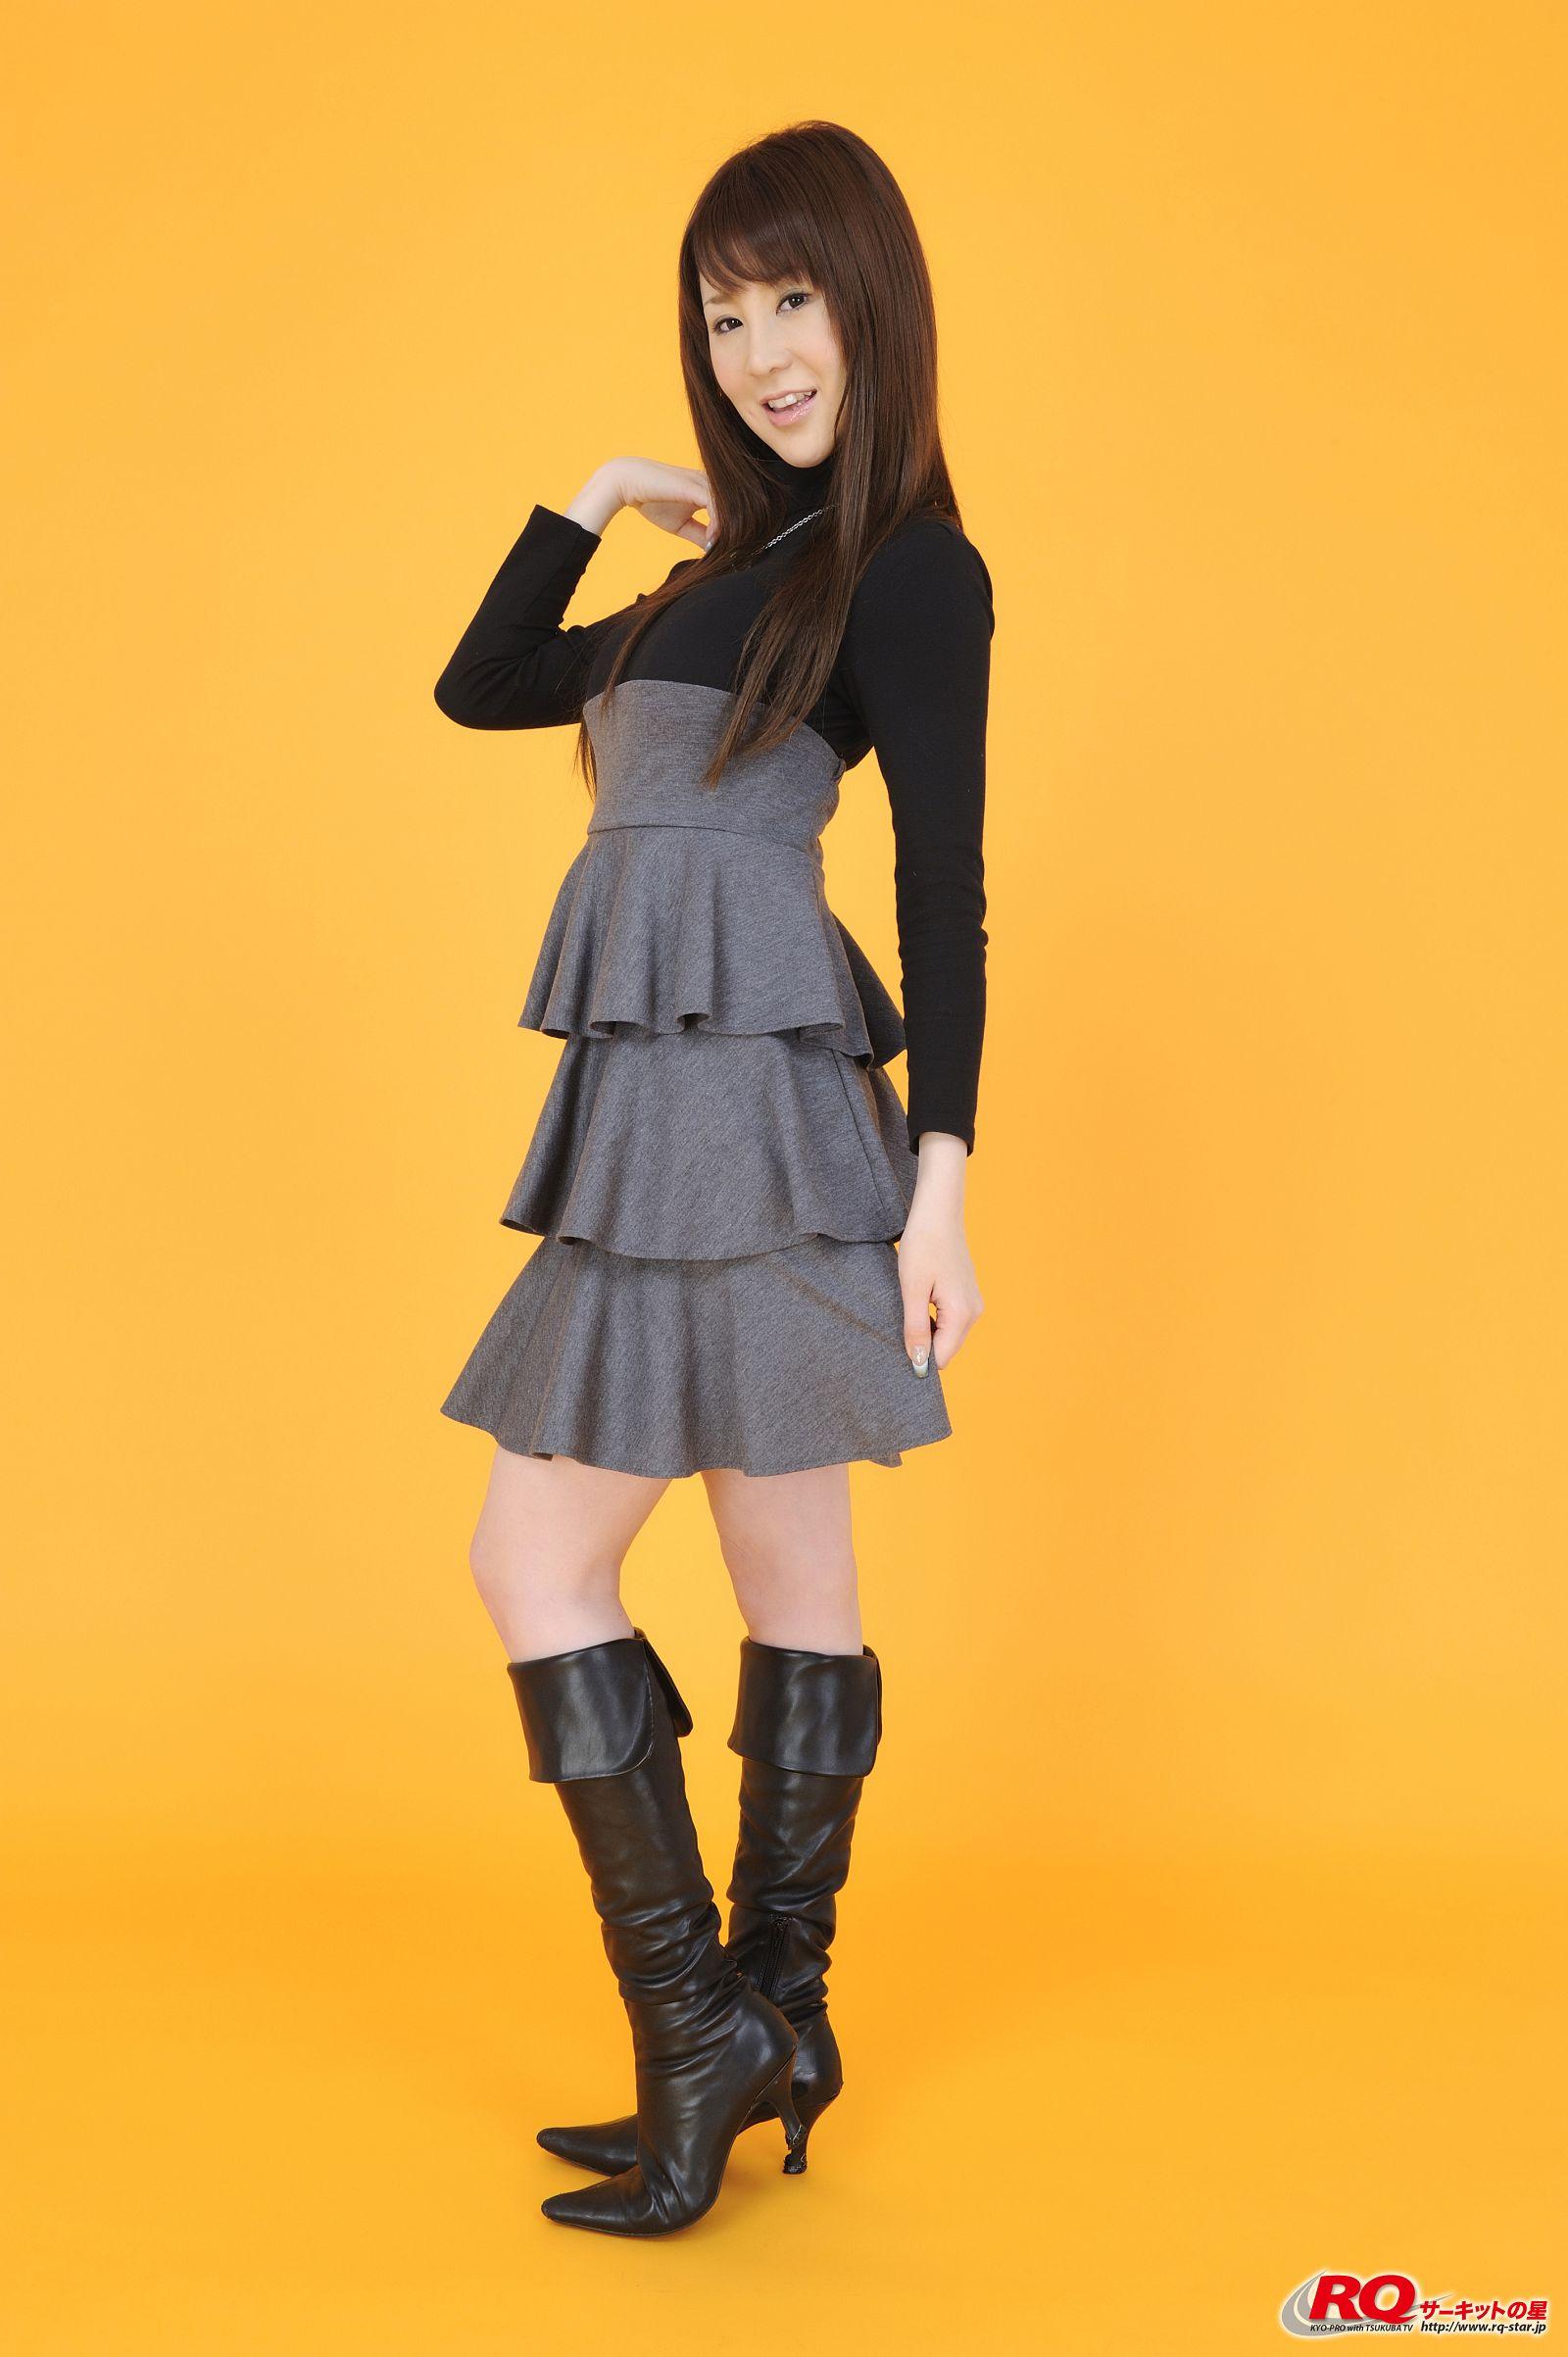 [RQ STAR美女] NO.00122 Yuko Nakamura 中村优子 Private Dress[81P] RQ STAR 第3张